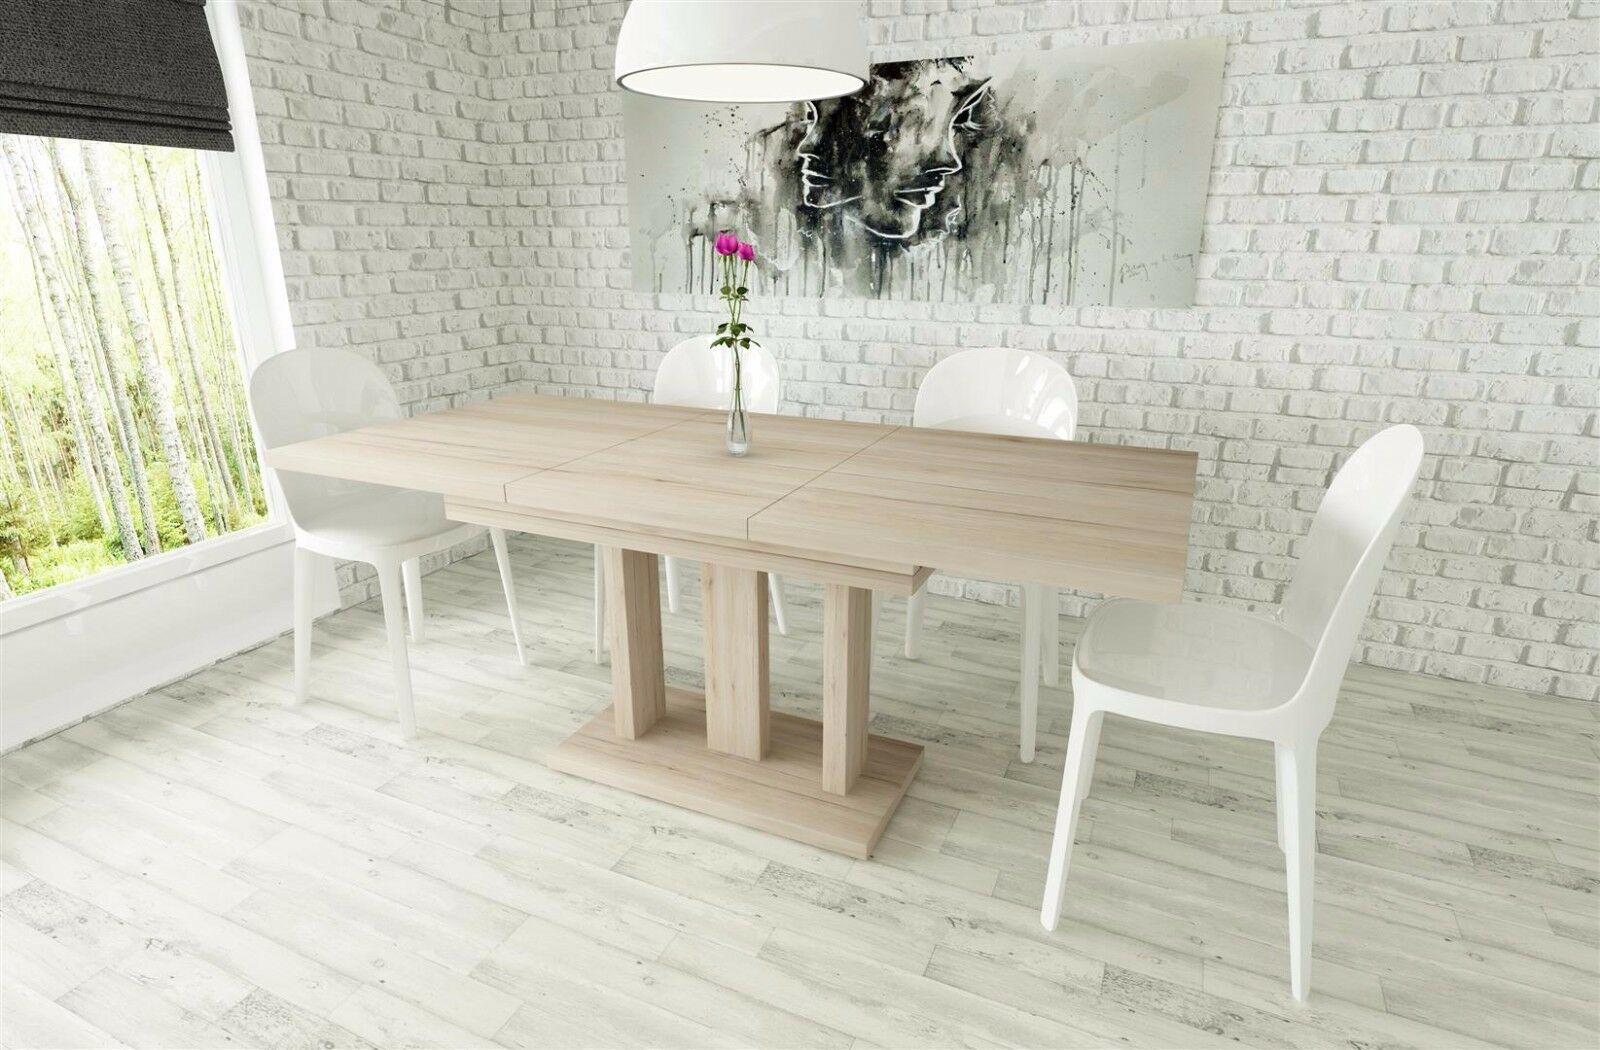 sulentisch wei stunning interesting ikea esstisch wei with ikea tisch lack wei with ikea tisch. Black Bedroom Furniture Sets. Home Design Ideas